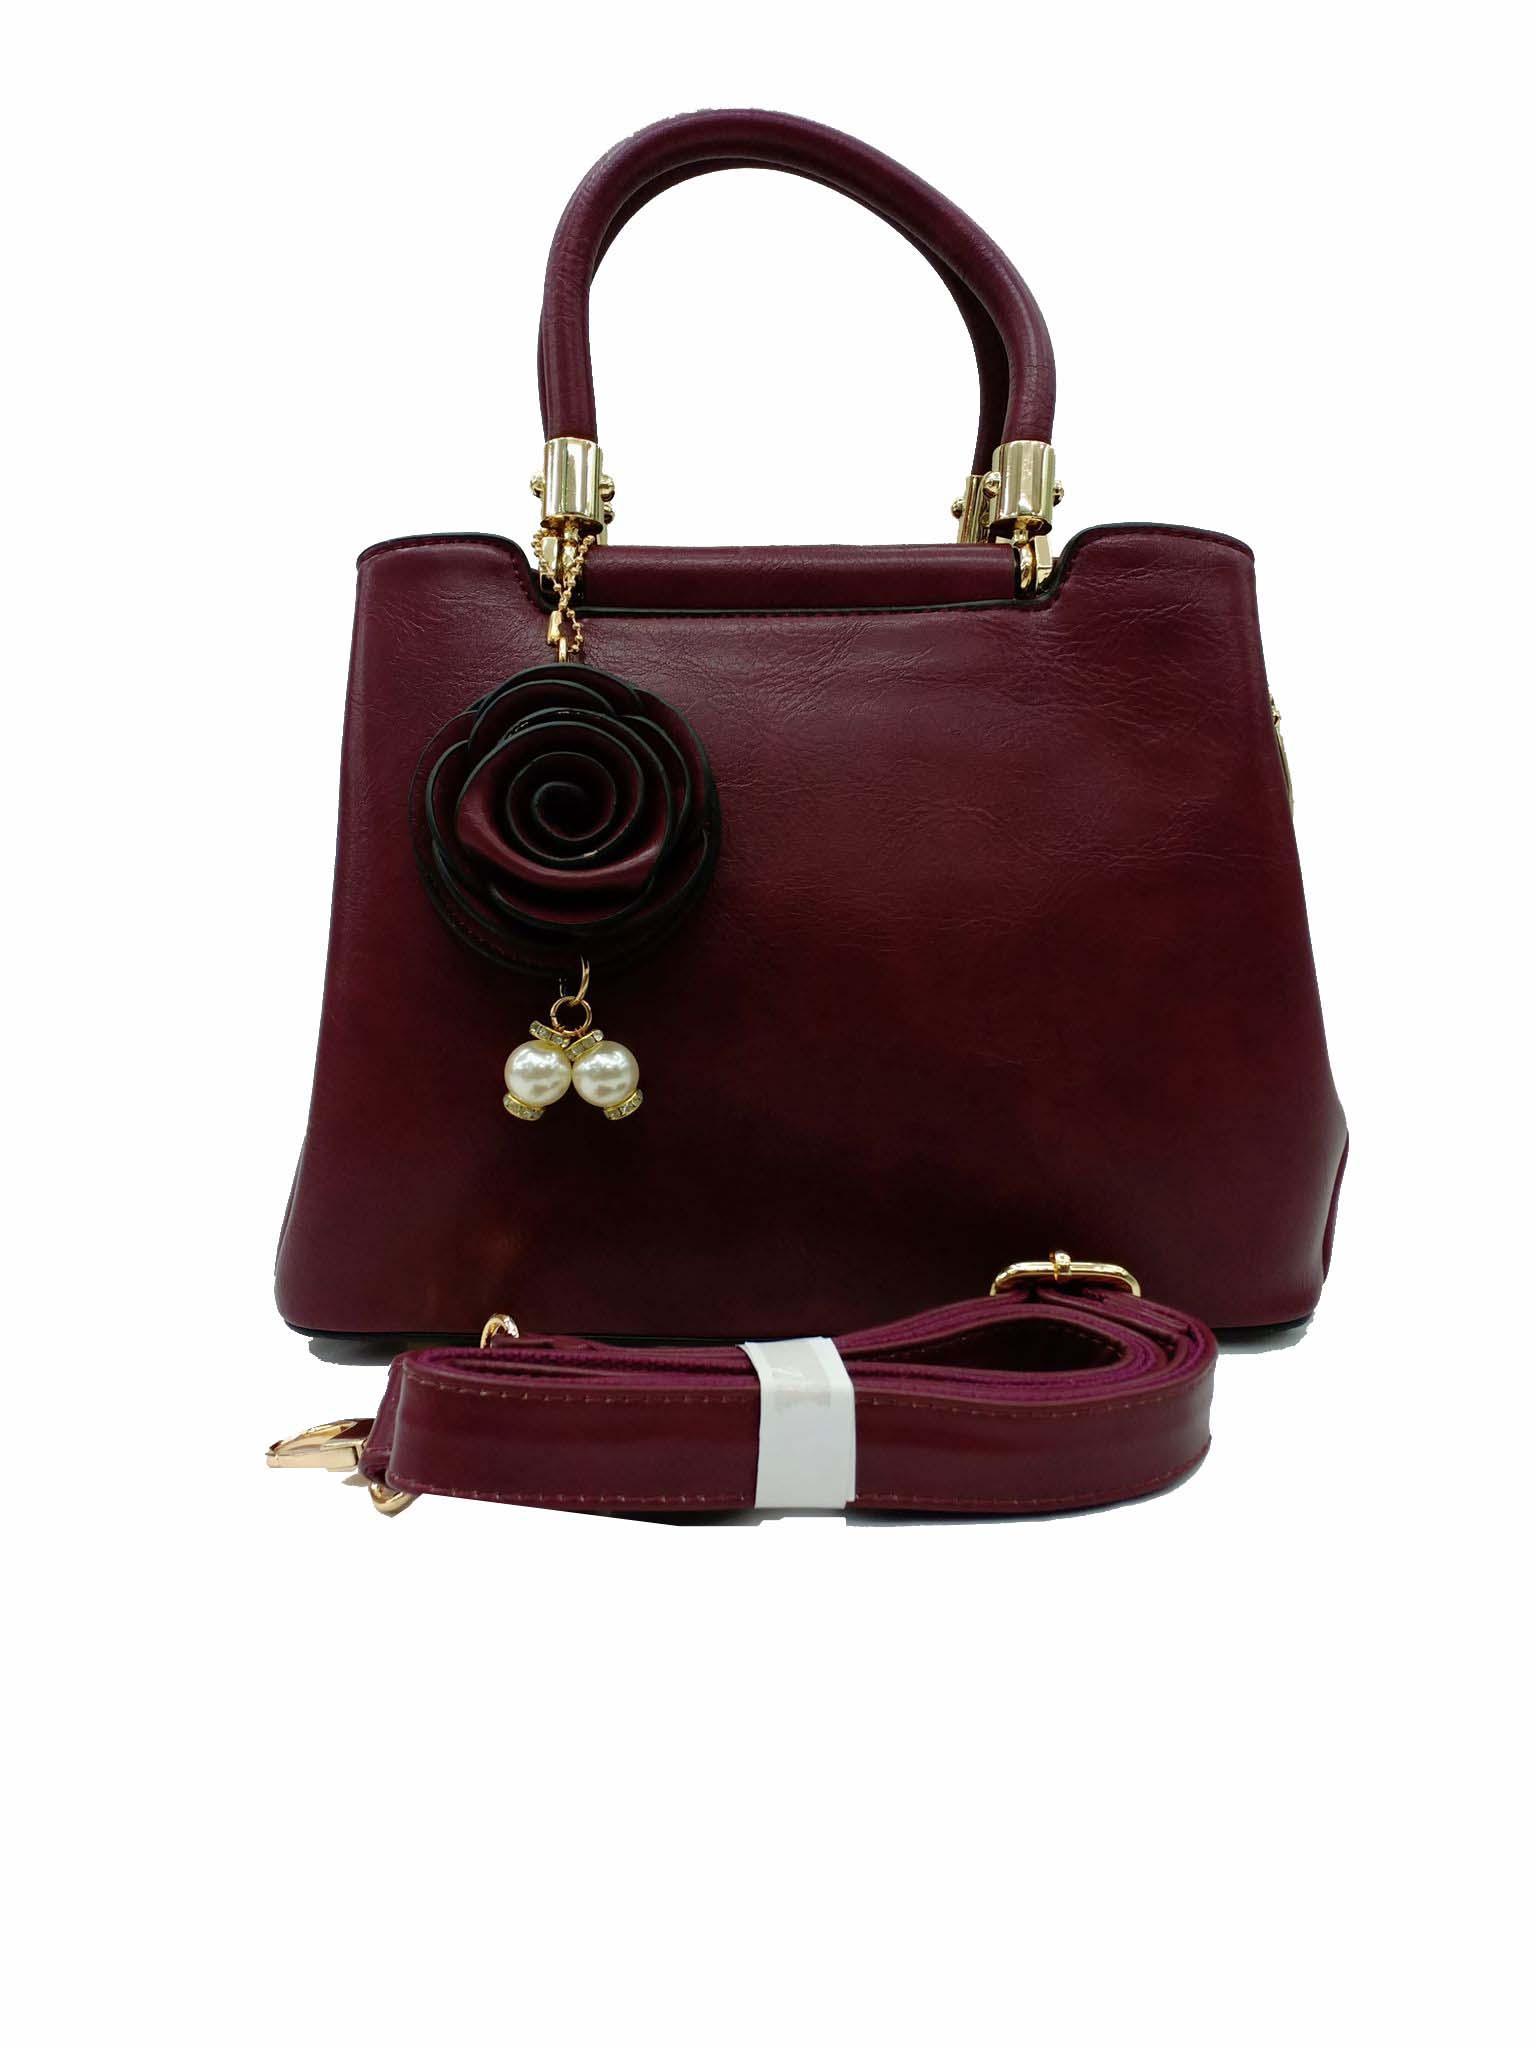 784e6fb77fd5d2 Ladies Handbags & Women's Handbags In Bangladesh At Best Price ...